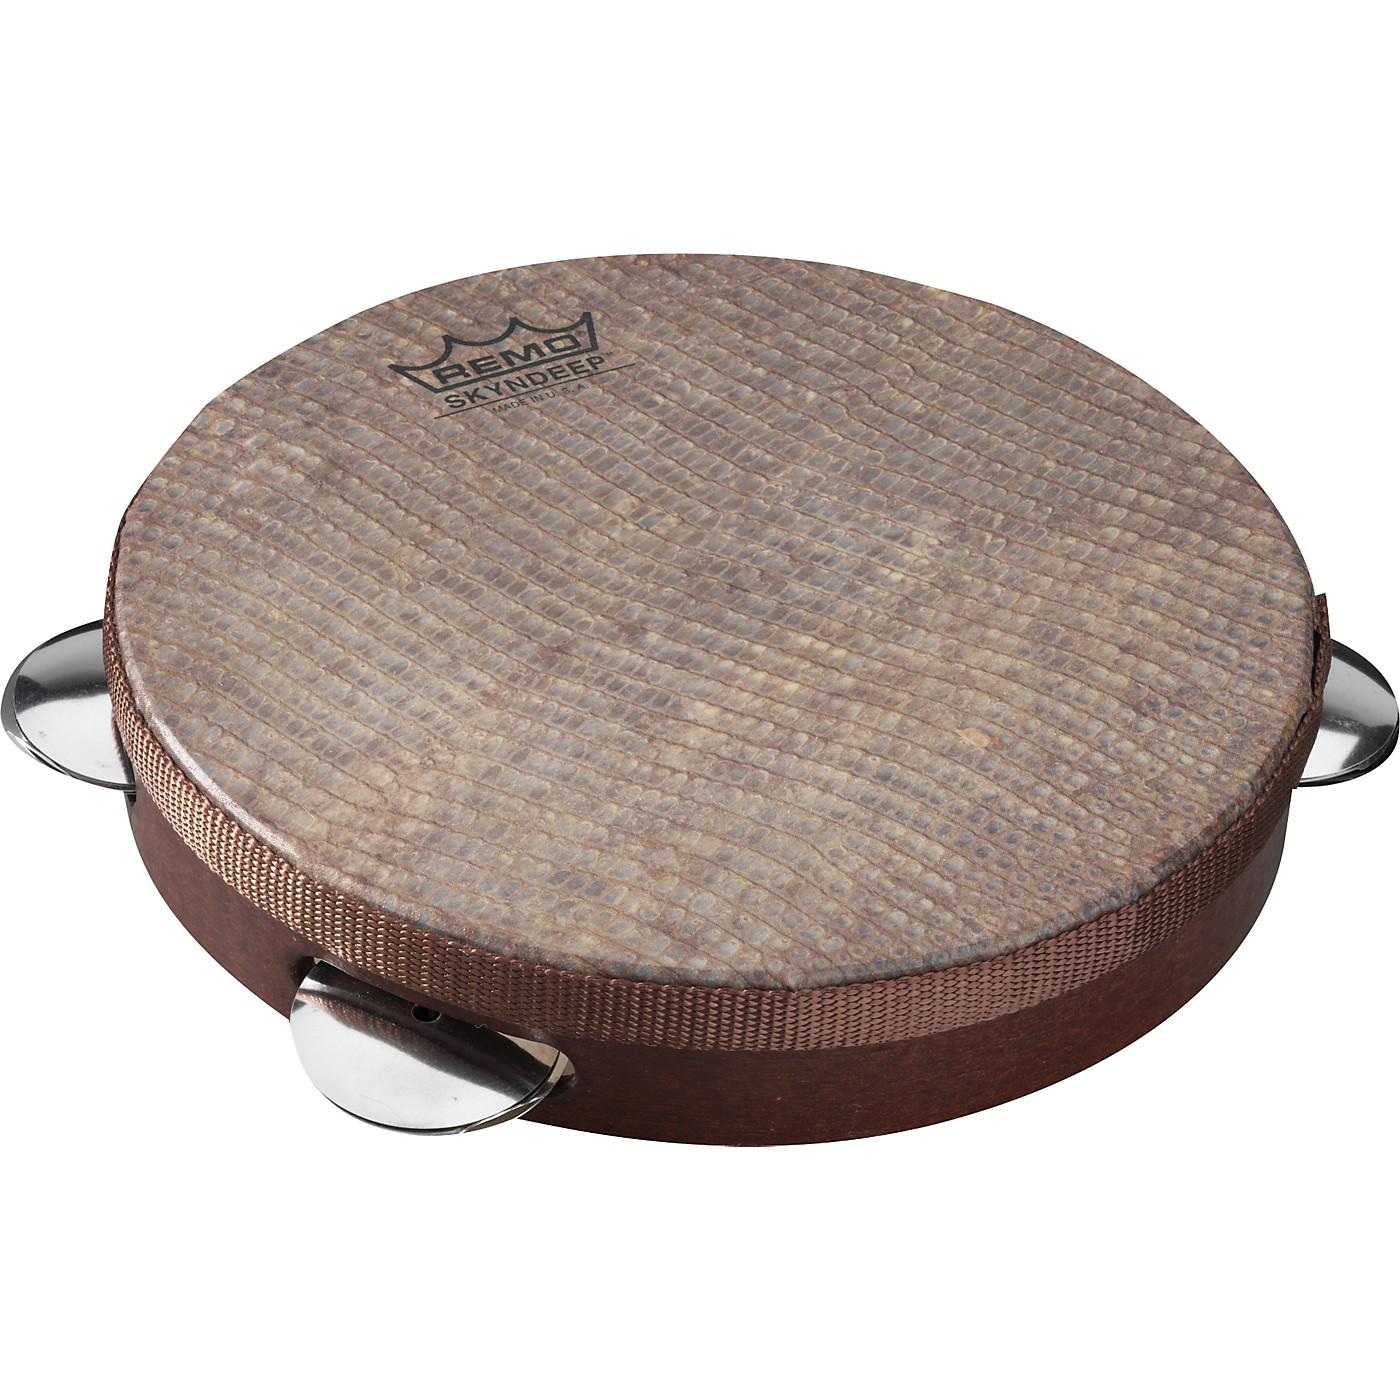 Remo Capoeira Pandeiro thumbnail